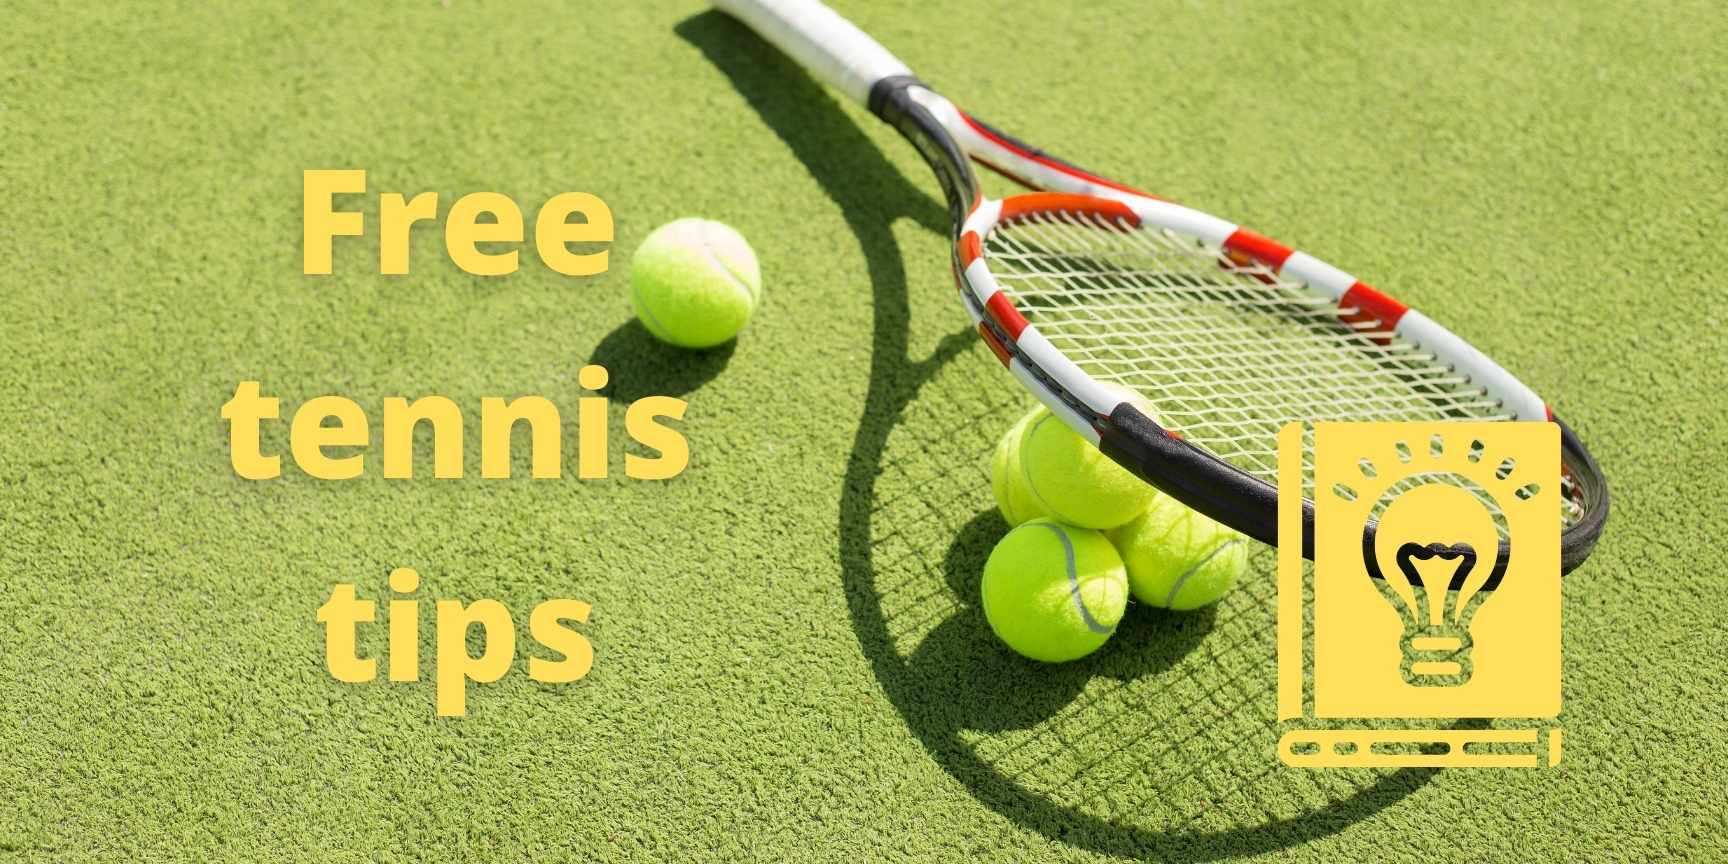 free tennis tips